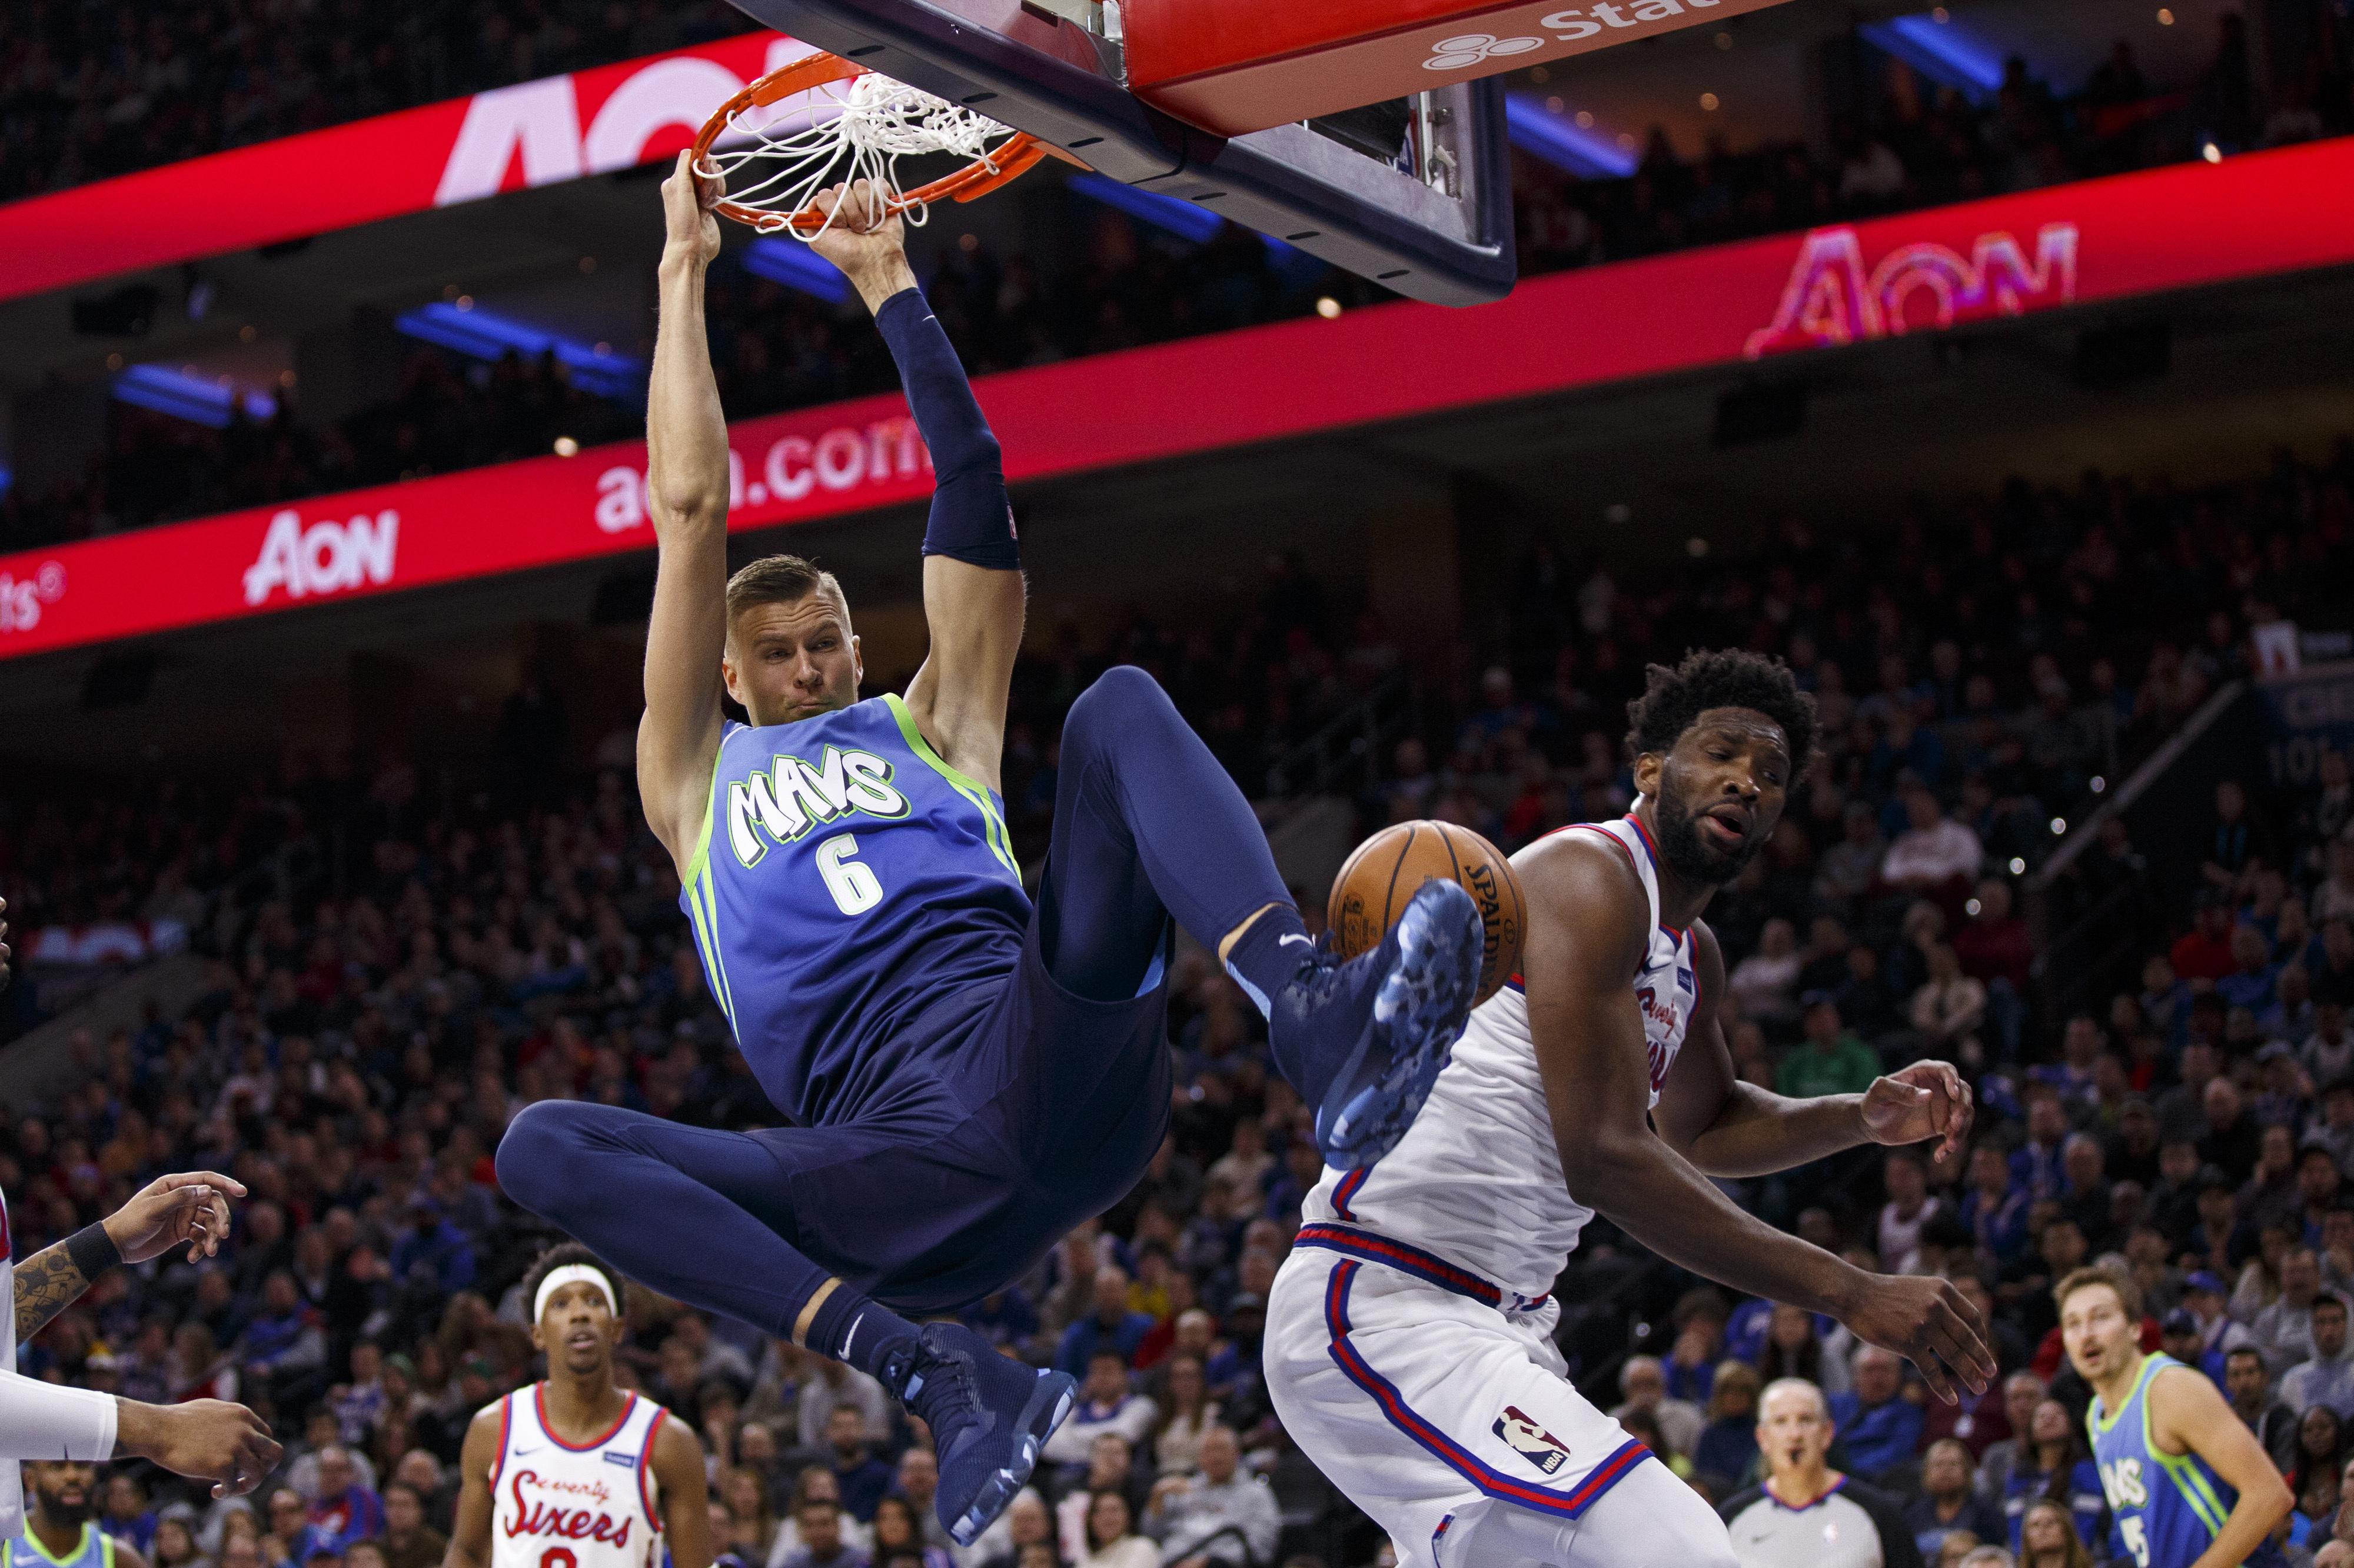 Porzingis leads short-handed Mavericks past 76ers 117-98